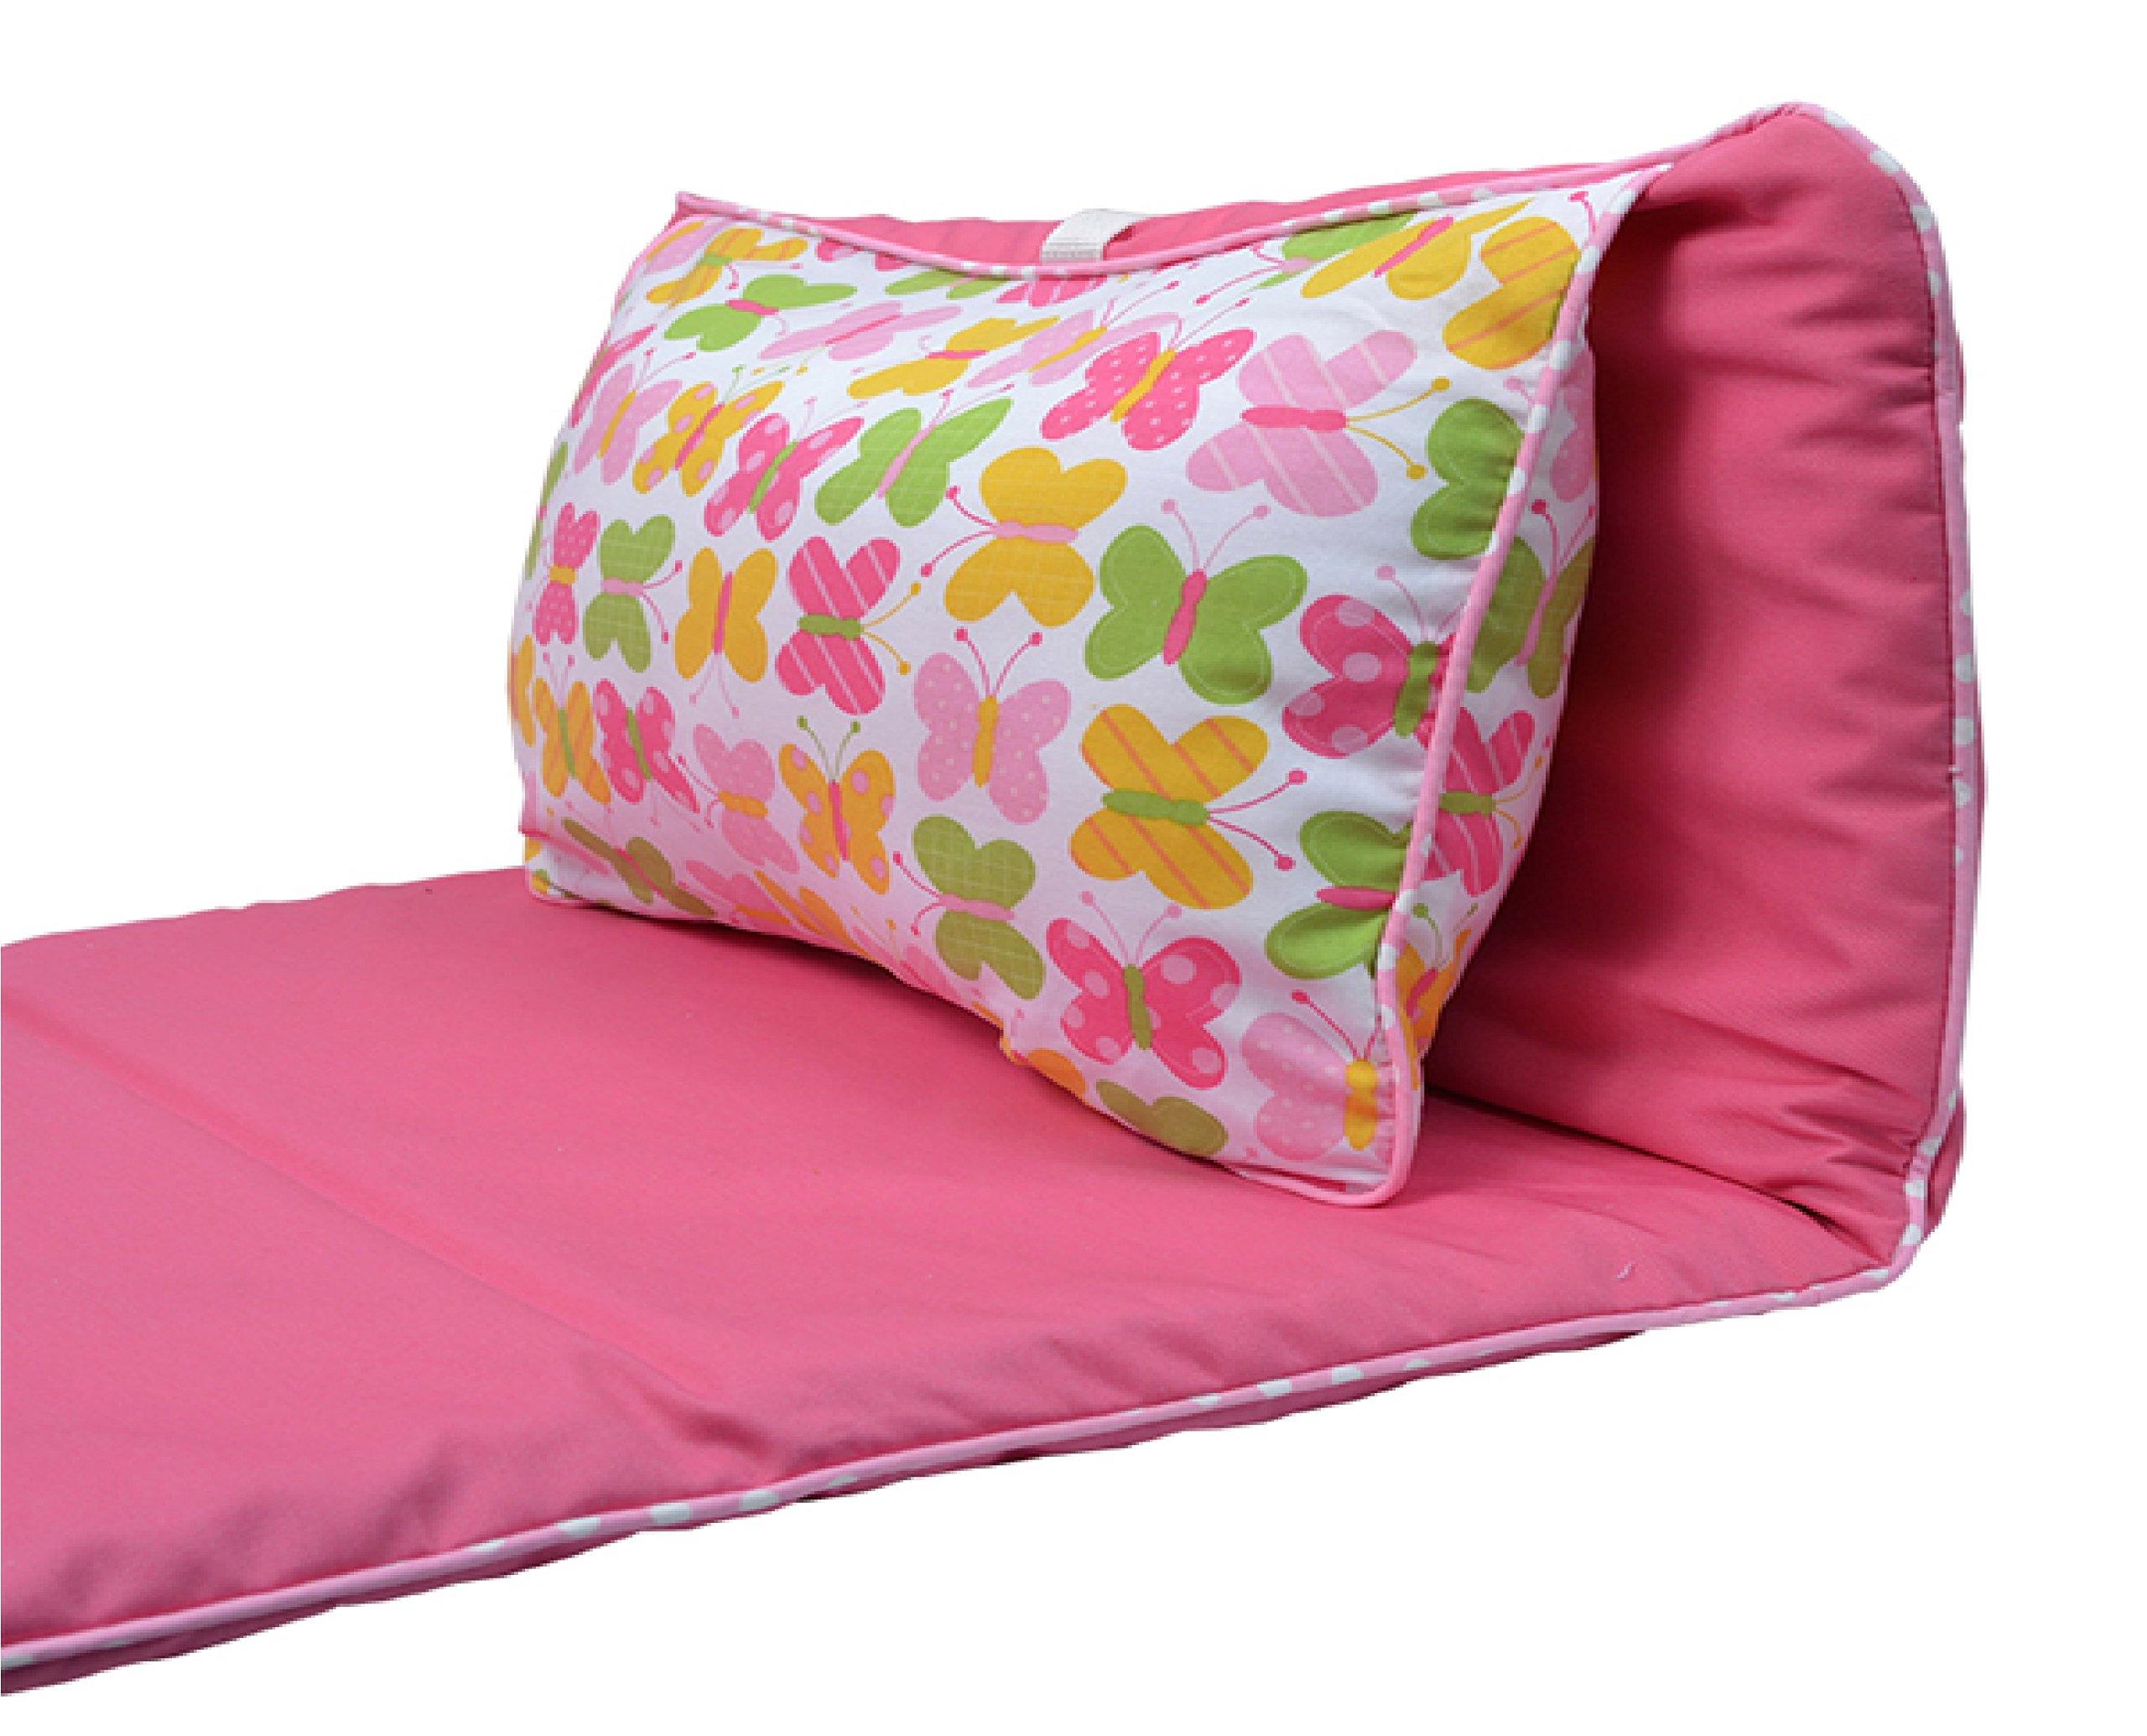 3Marthas Boutique Children Toddler Canvas Nap Mat (Pink - Butterfly Kisses)